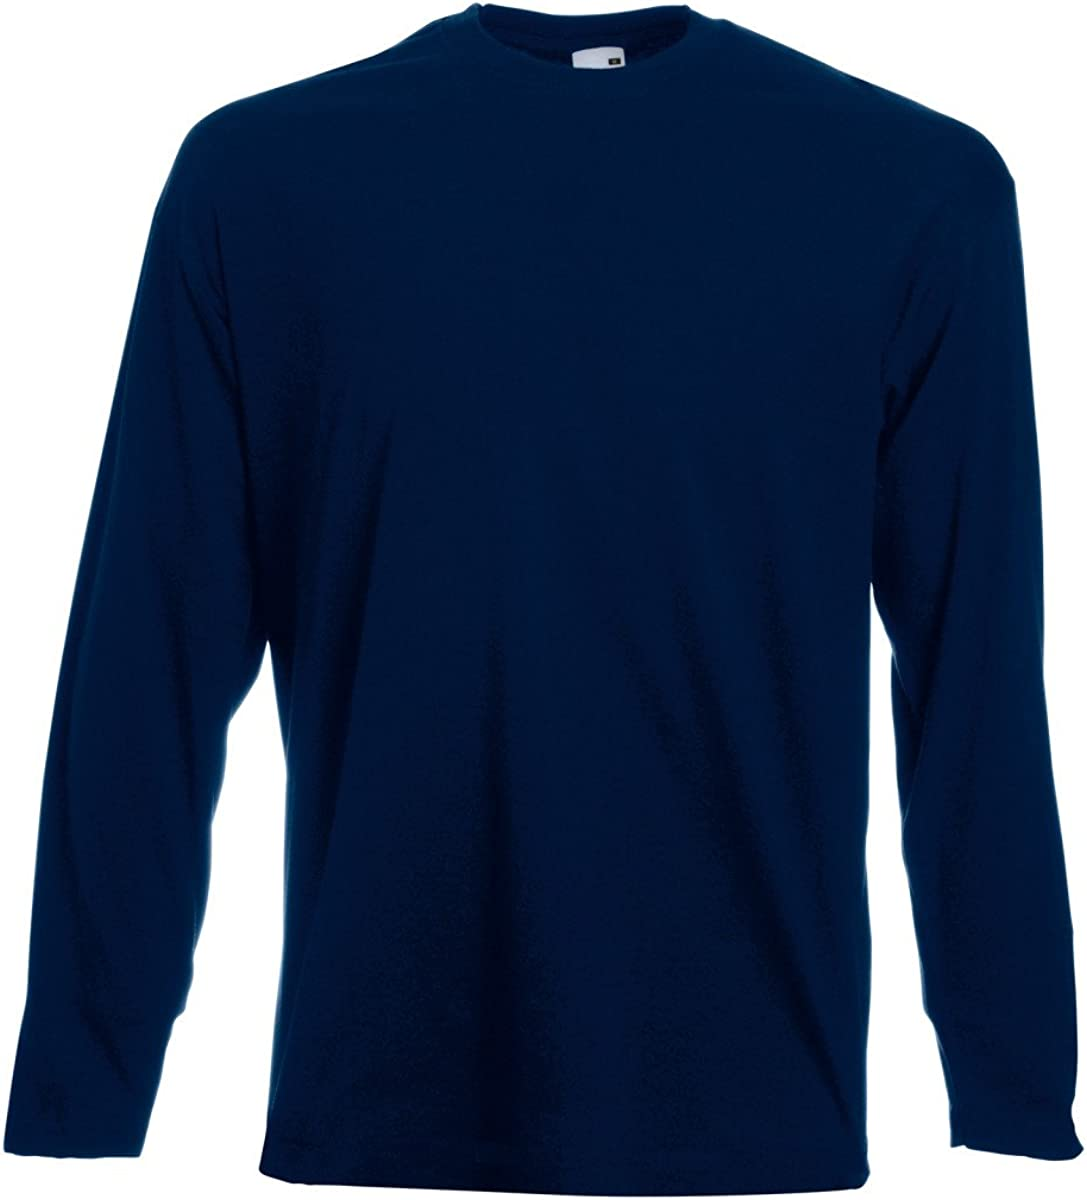 Maglietta a maniche lunghe da uomo Fruit of The Loom Valueweight